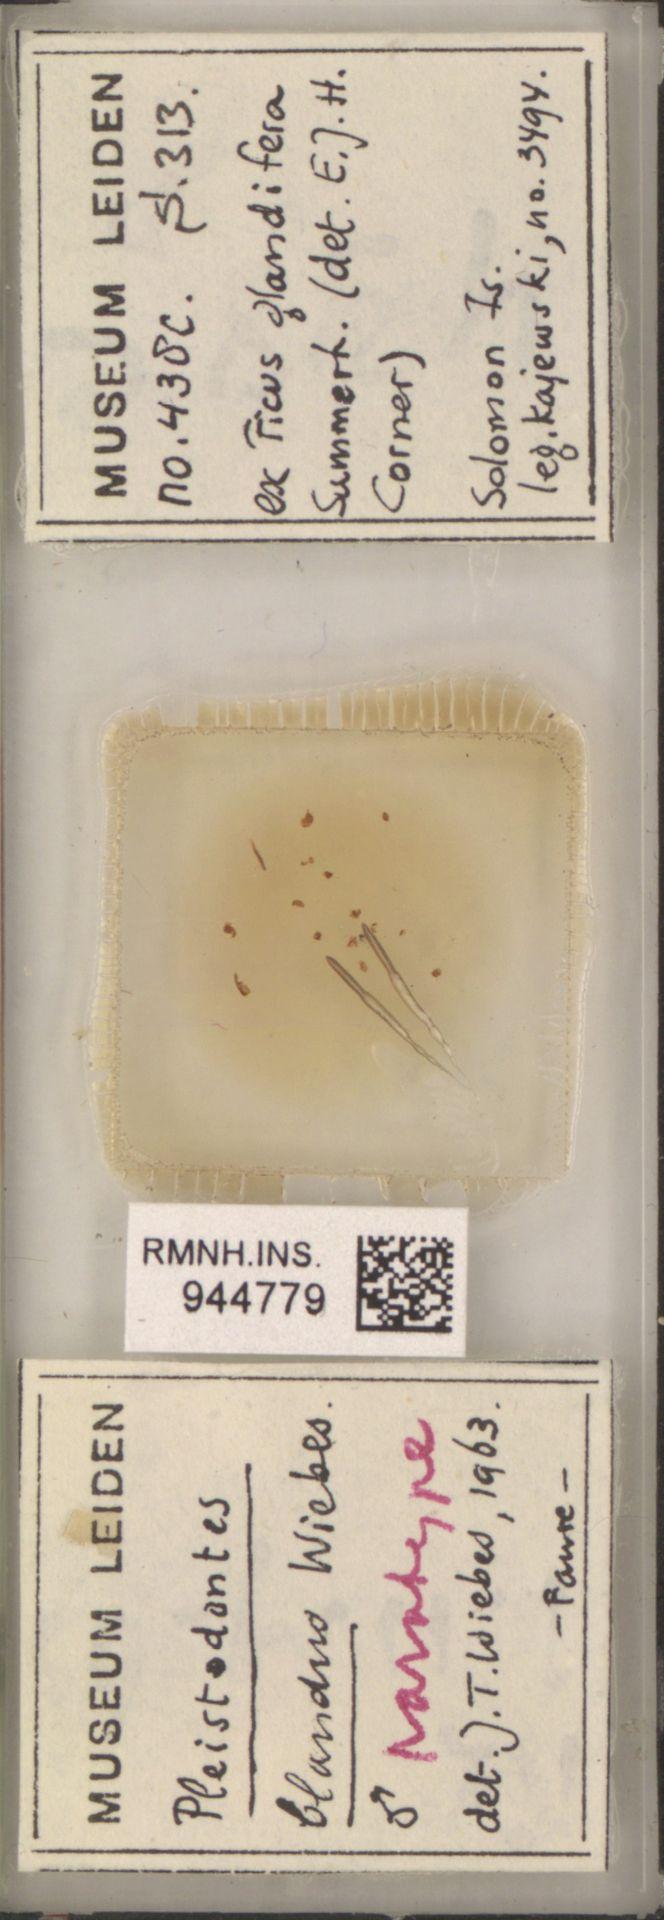 RMNH.INS.944779 | Pleistodontes blandus Wiebes